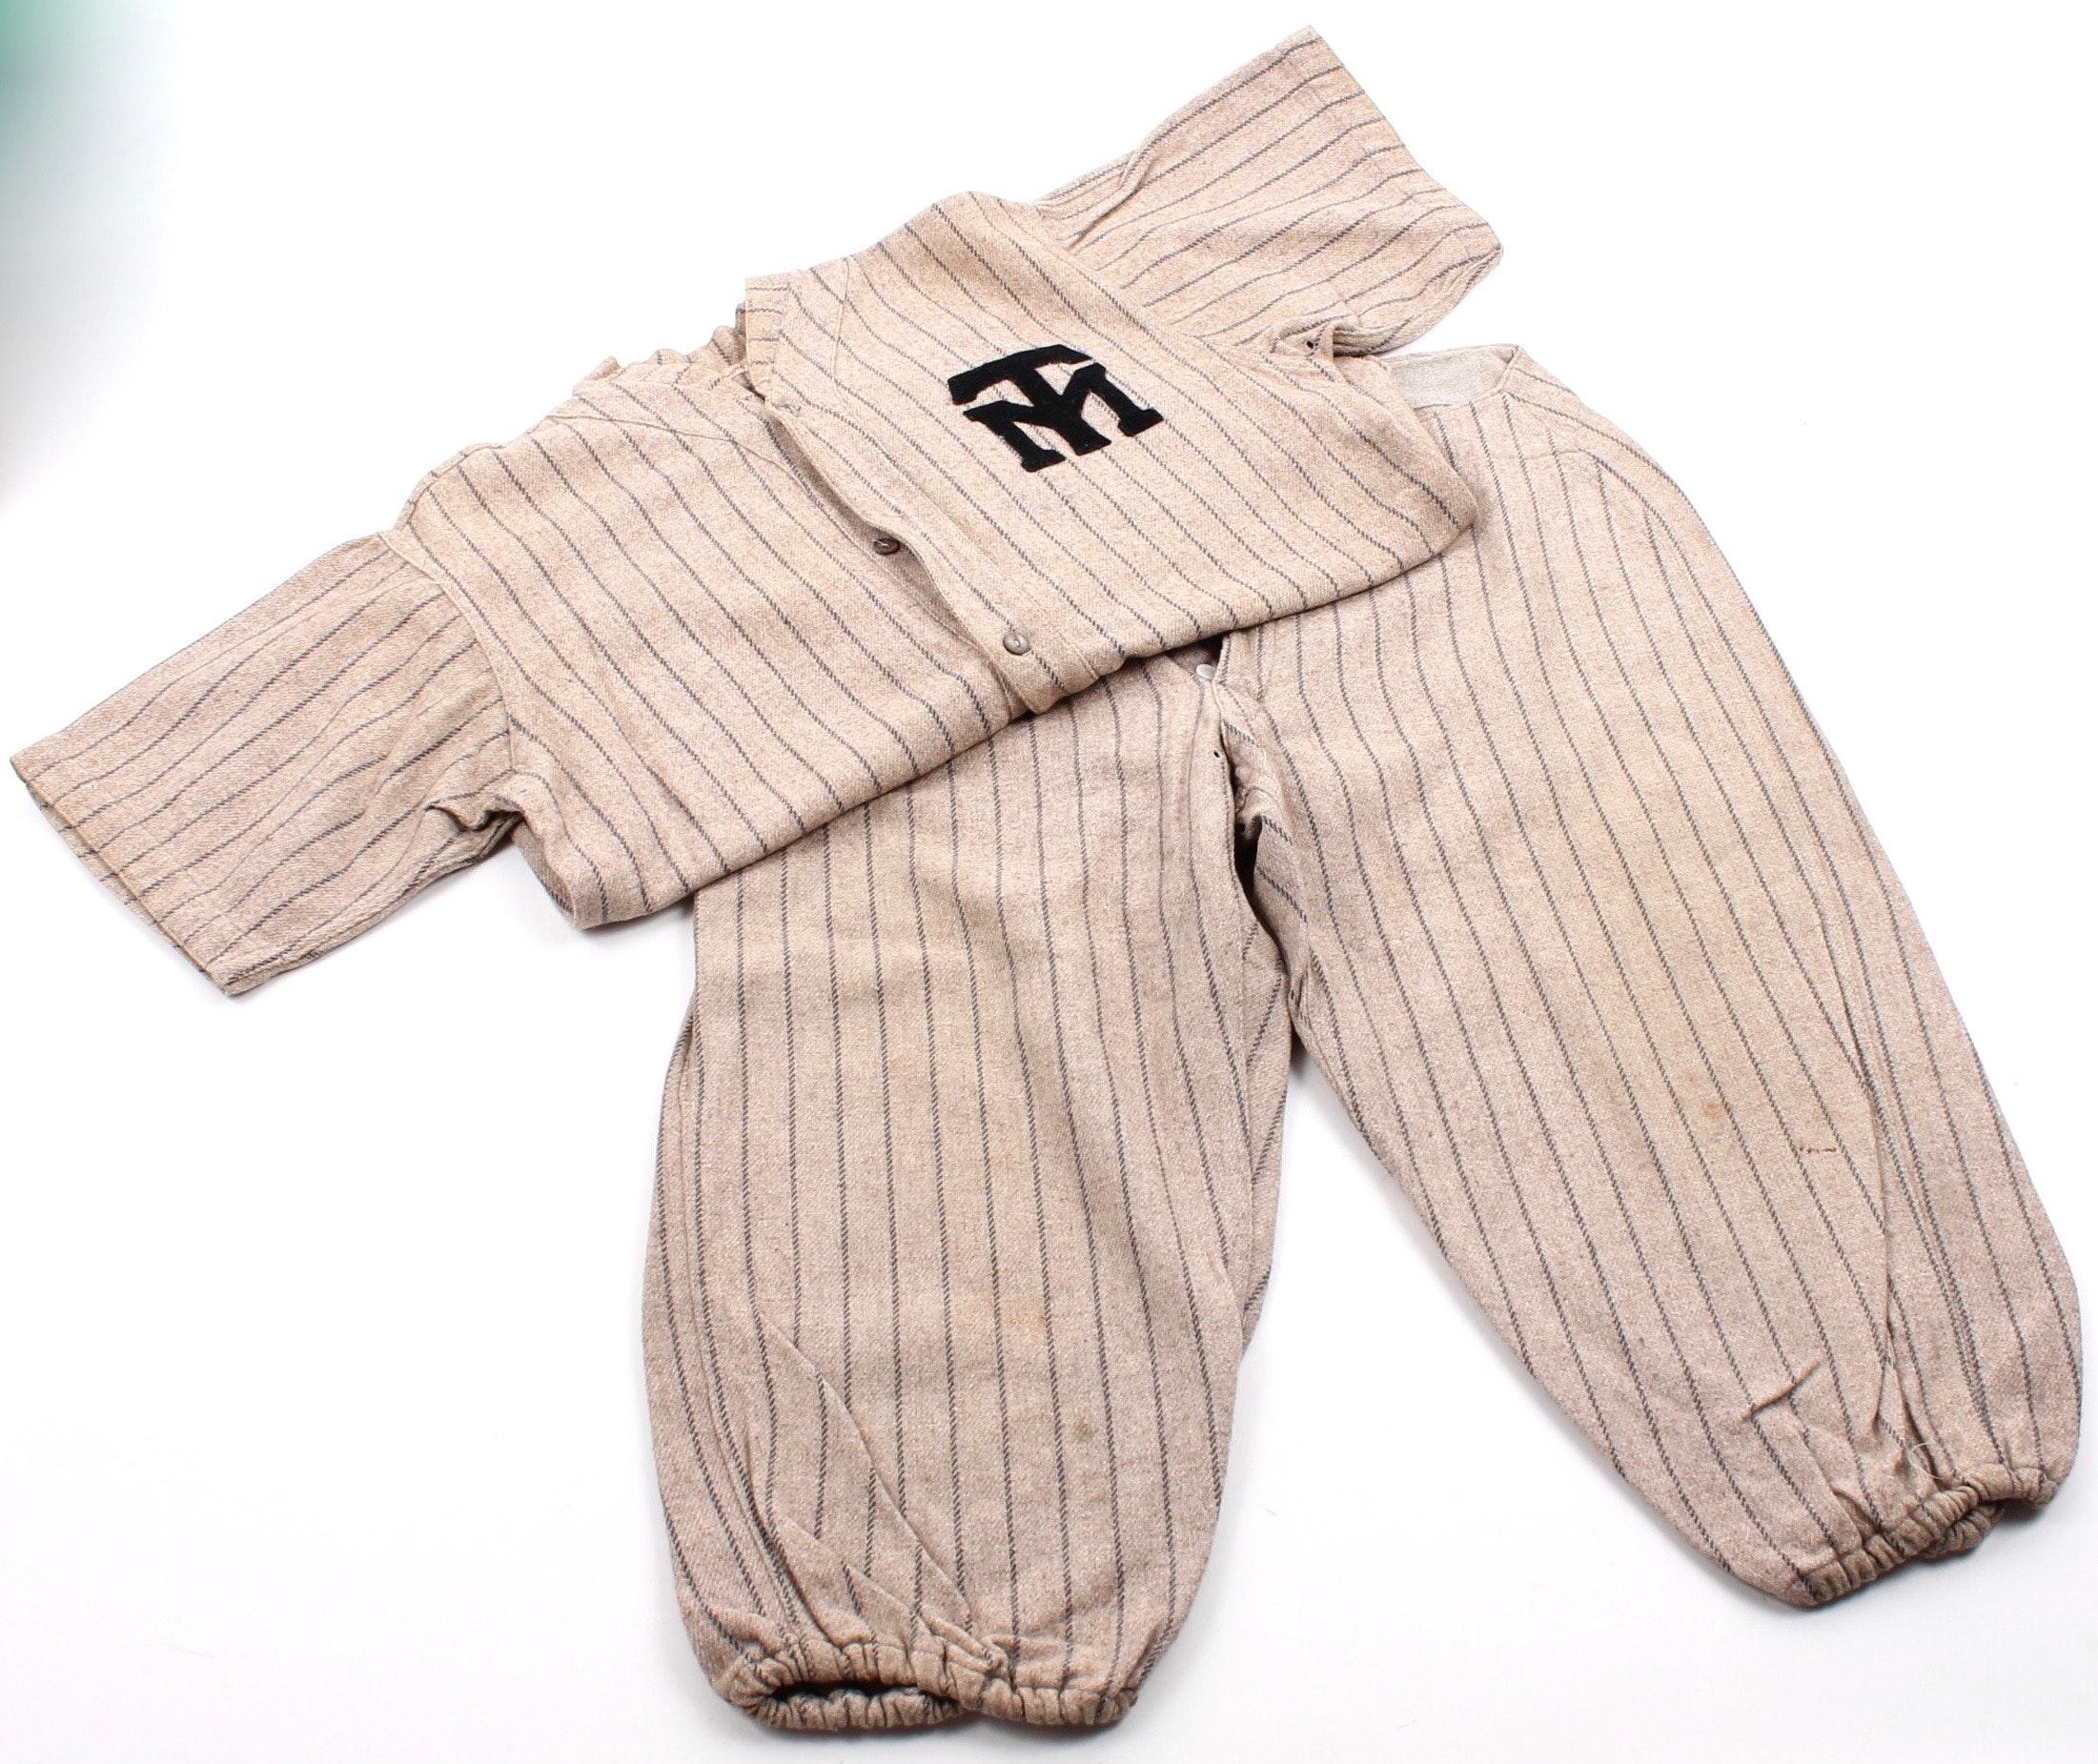 "Vintage 1930s Wool ""Mendel the Tailor"" Baseball Uniform"